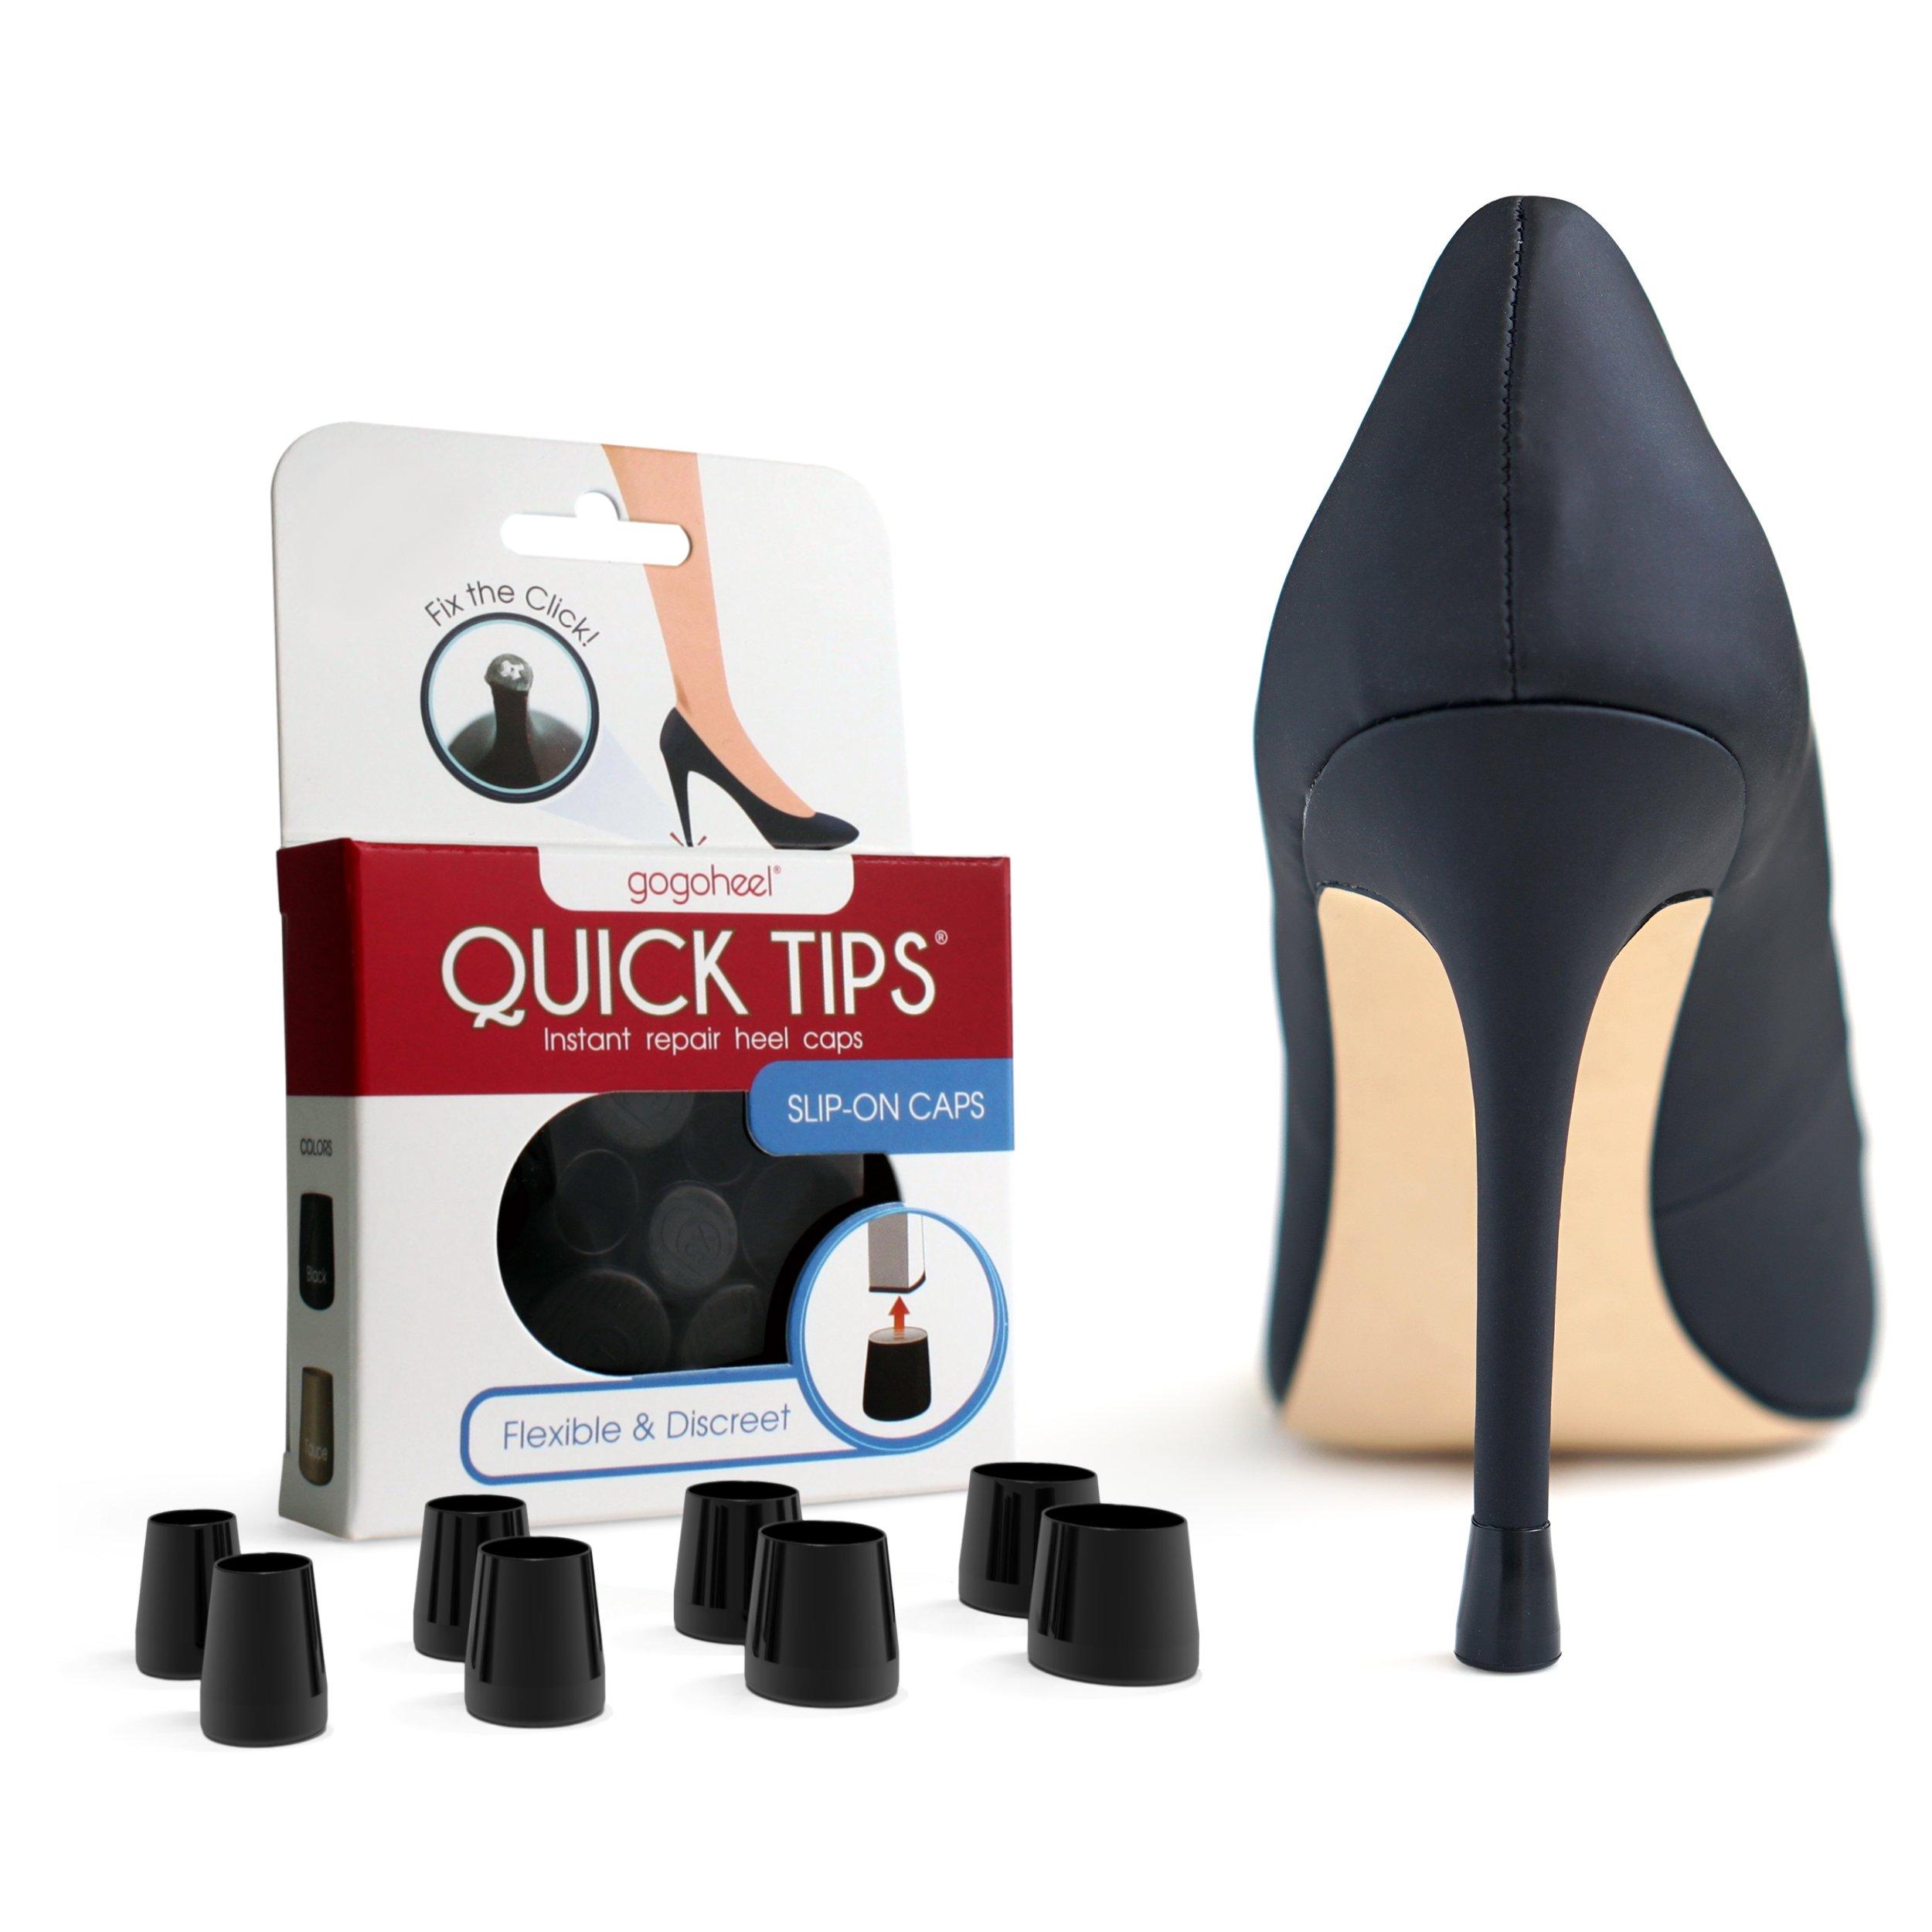 QUICK TIPS High Heel Protector & Heel Repair Caps (4 Pairs, Black)